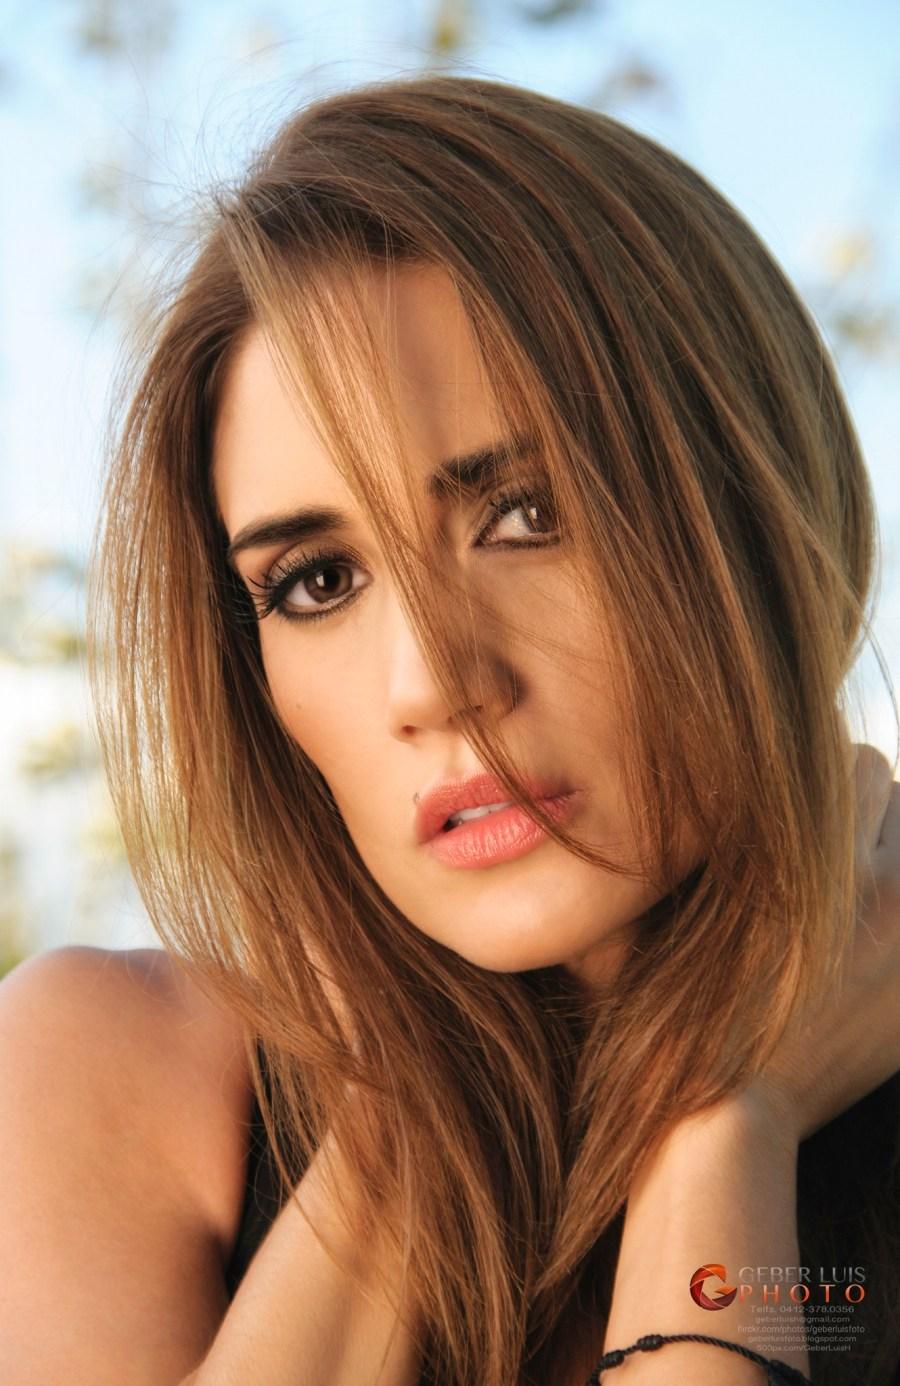 EileenAbad3